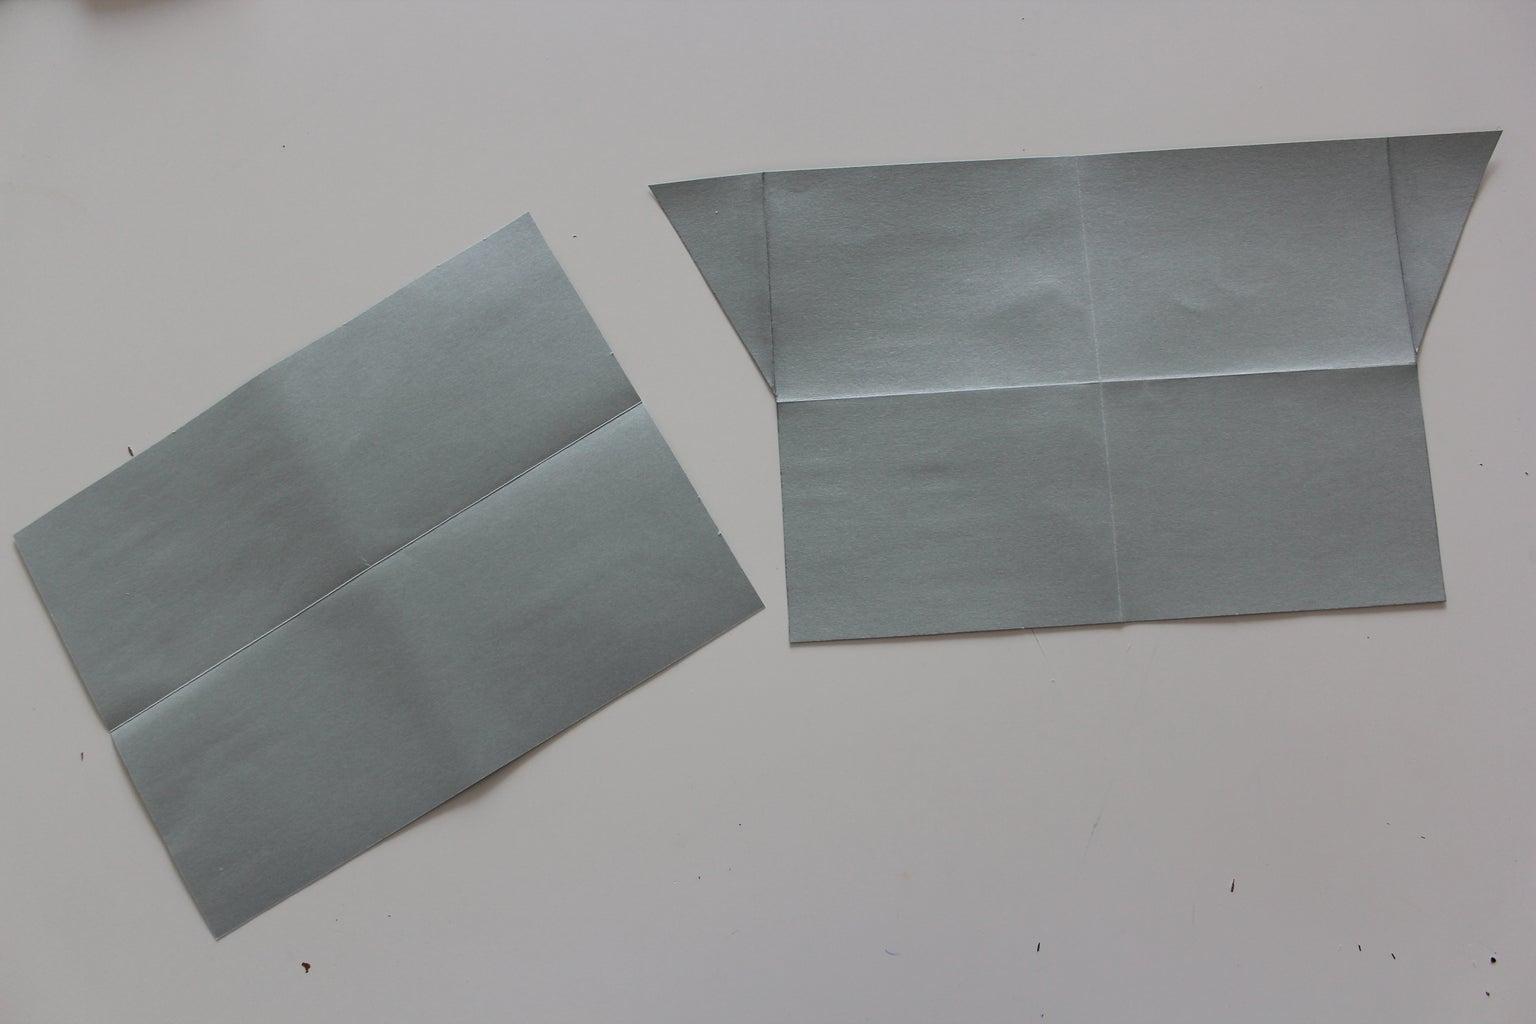 The Folding